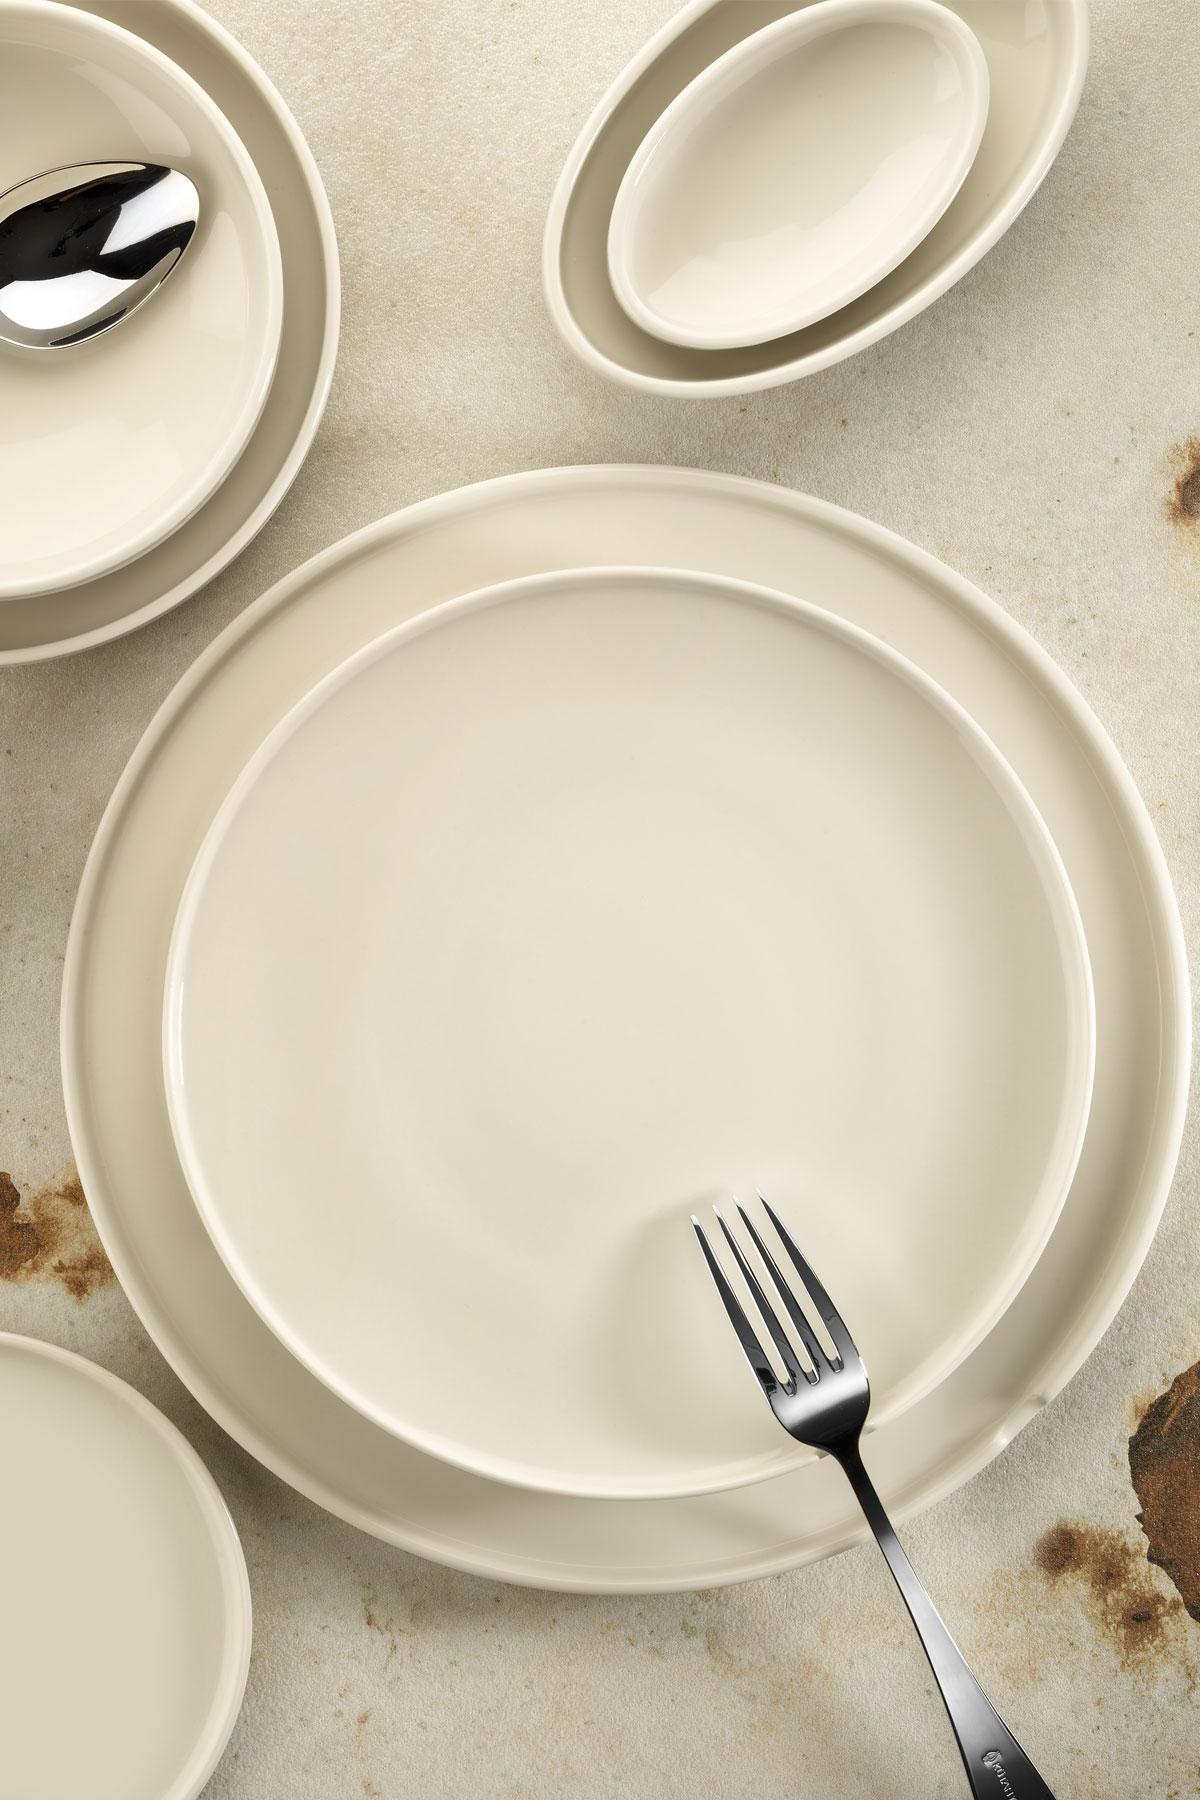 Kütahya Porselen Chef Taste Of 14 cm Oval Kase Krem